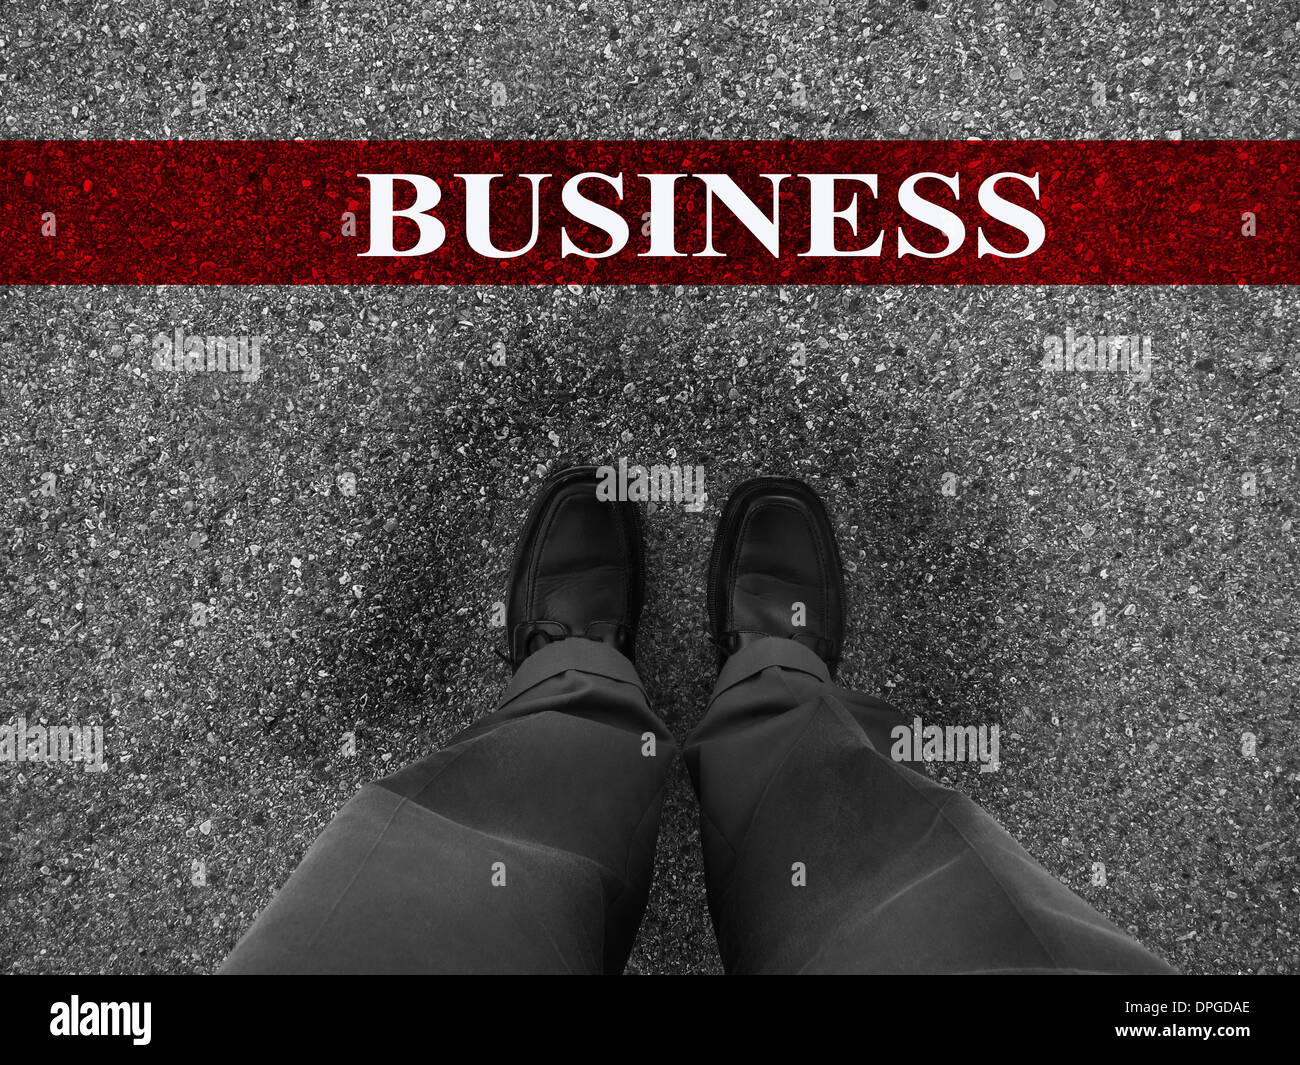 Businessman standing on asphalt starting line with motivation word of Business - Stock Image